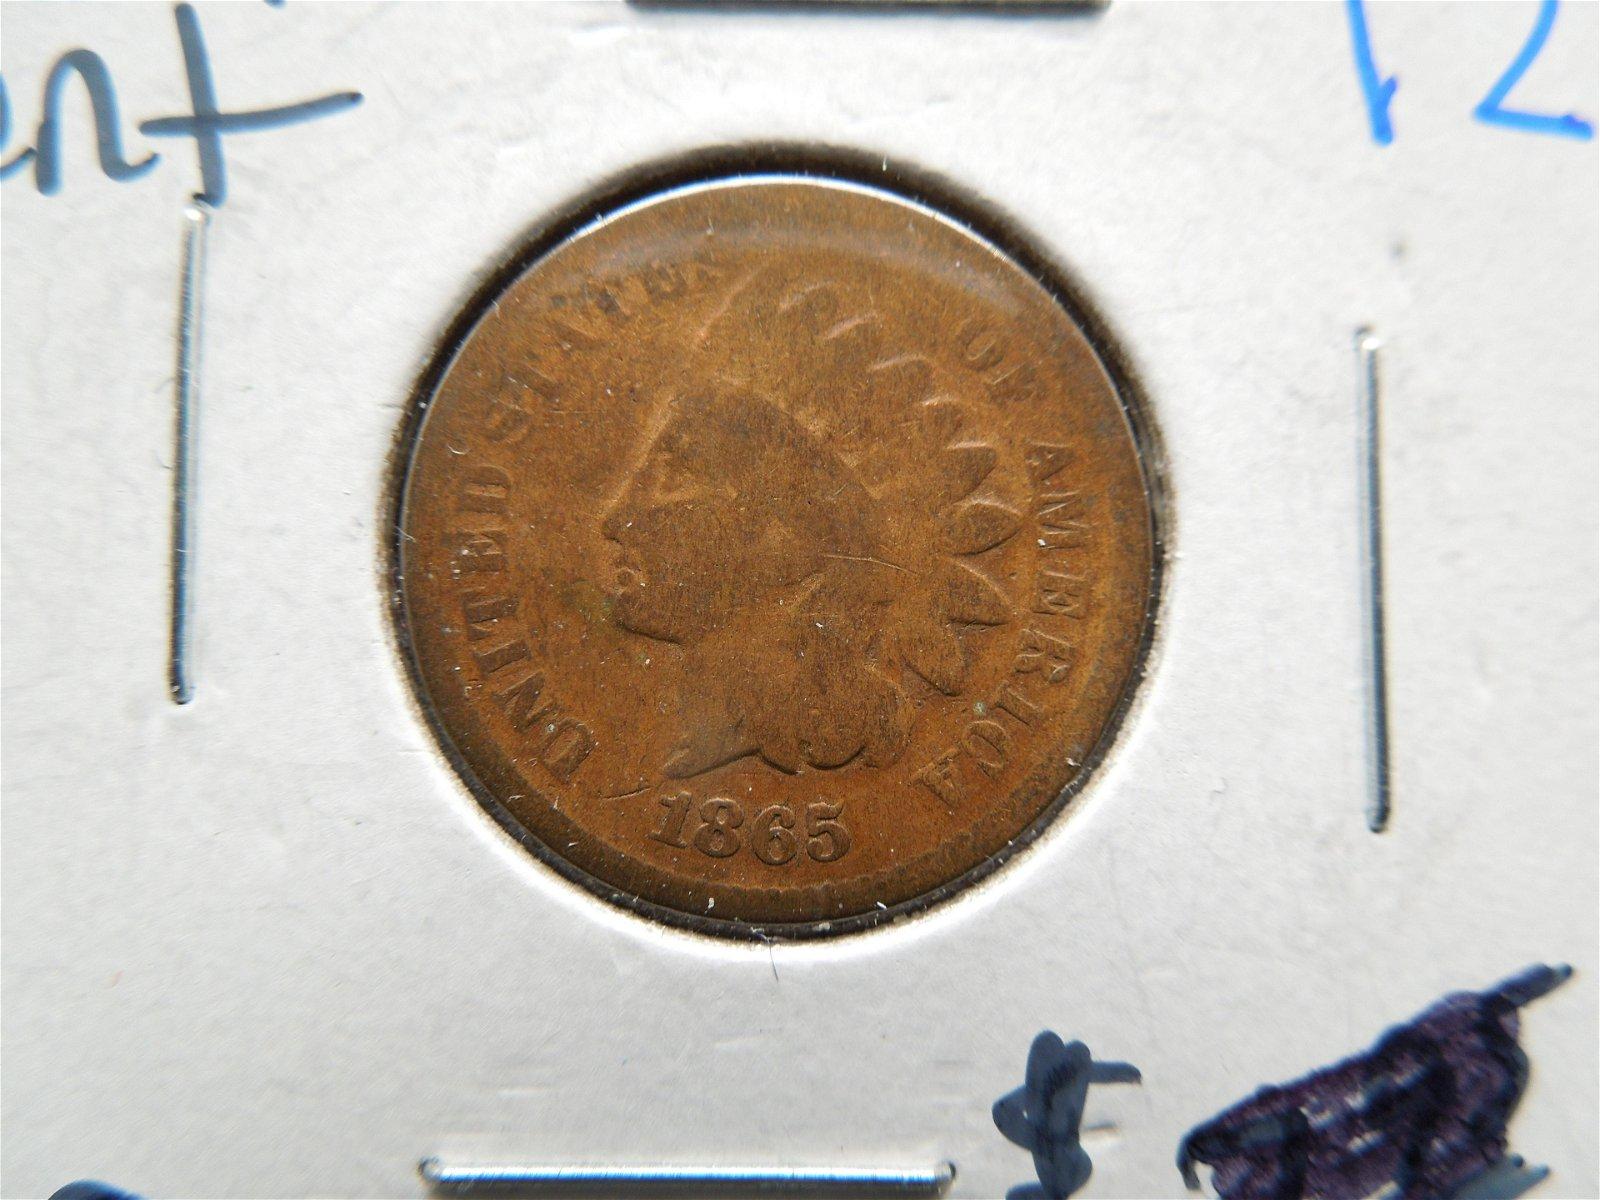 1865 civil war era Indian head cent